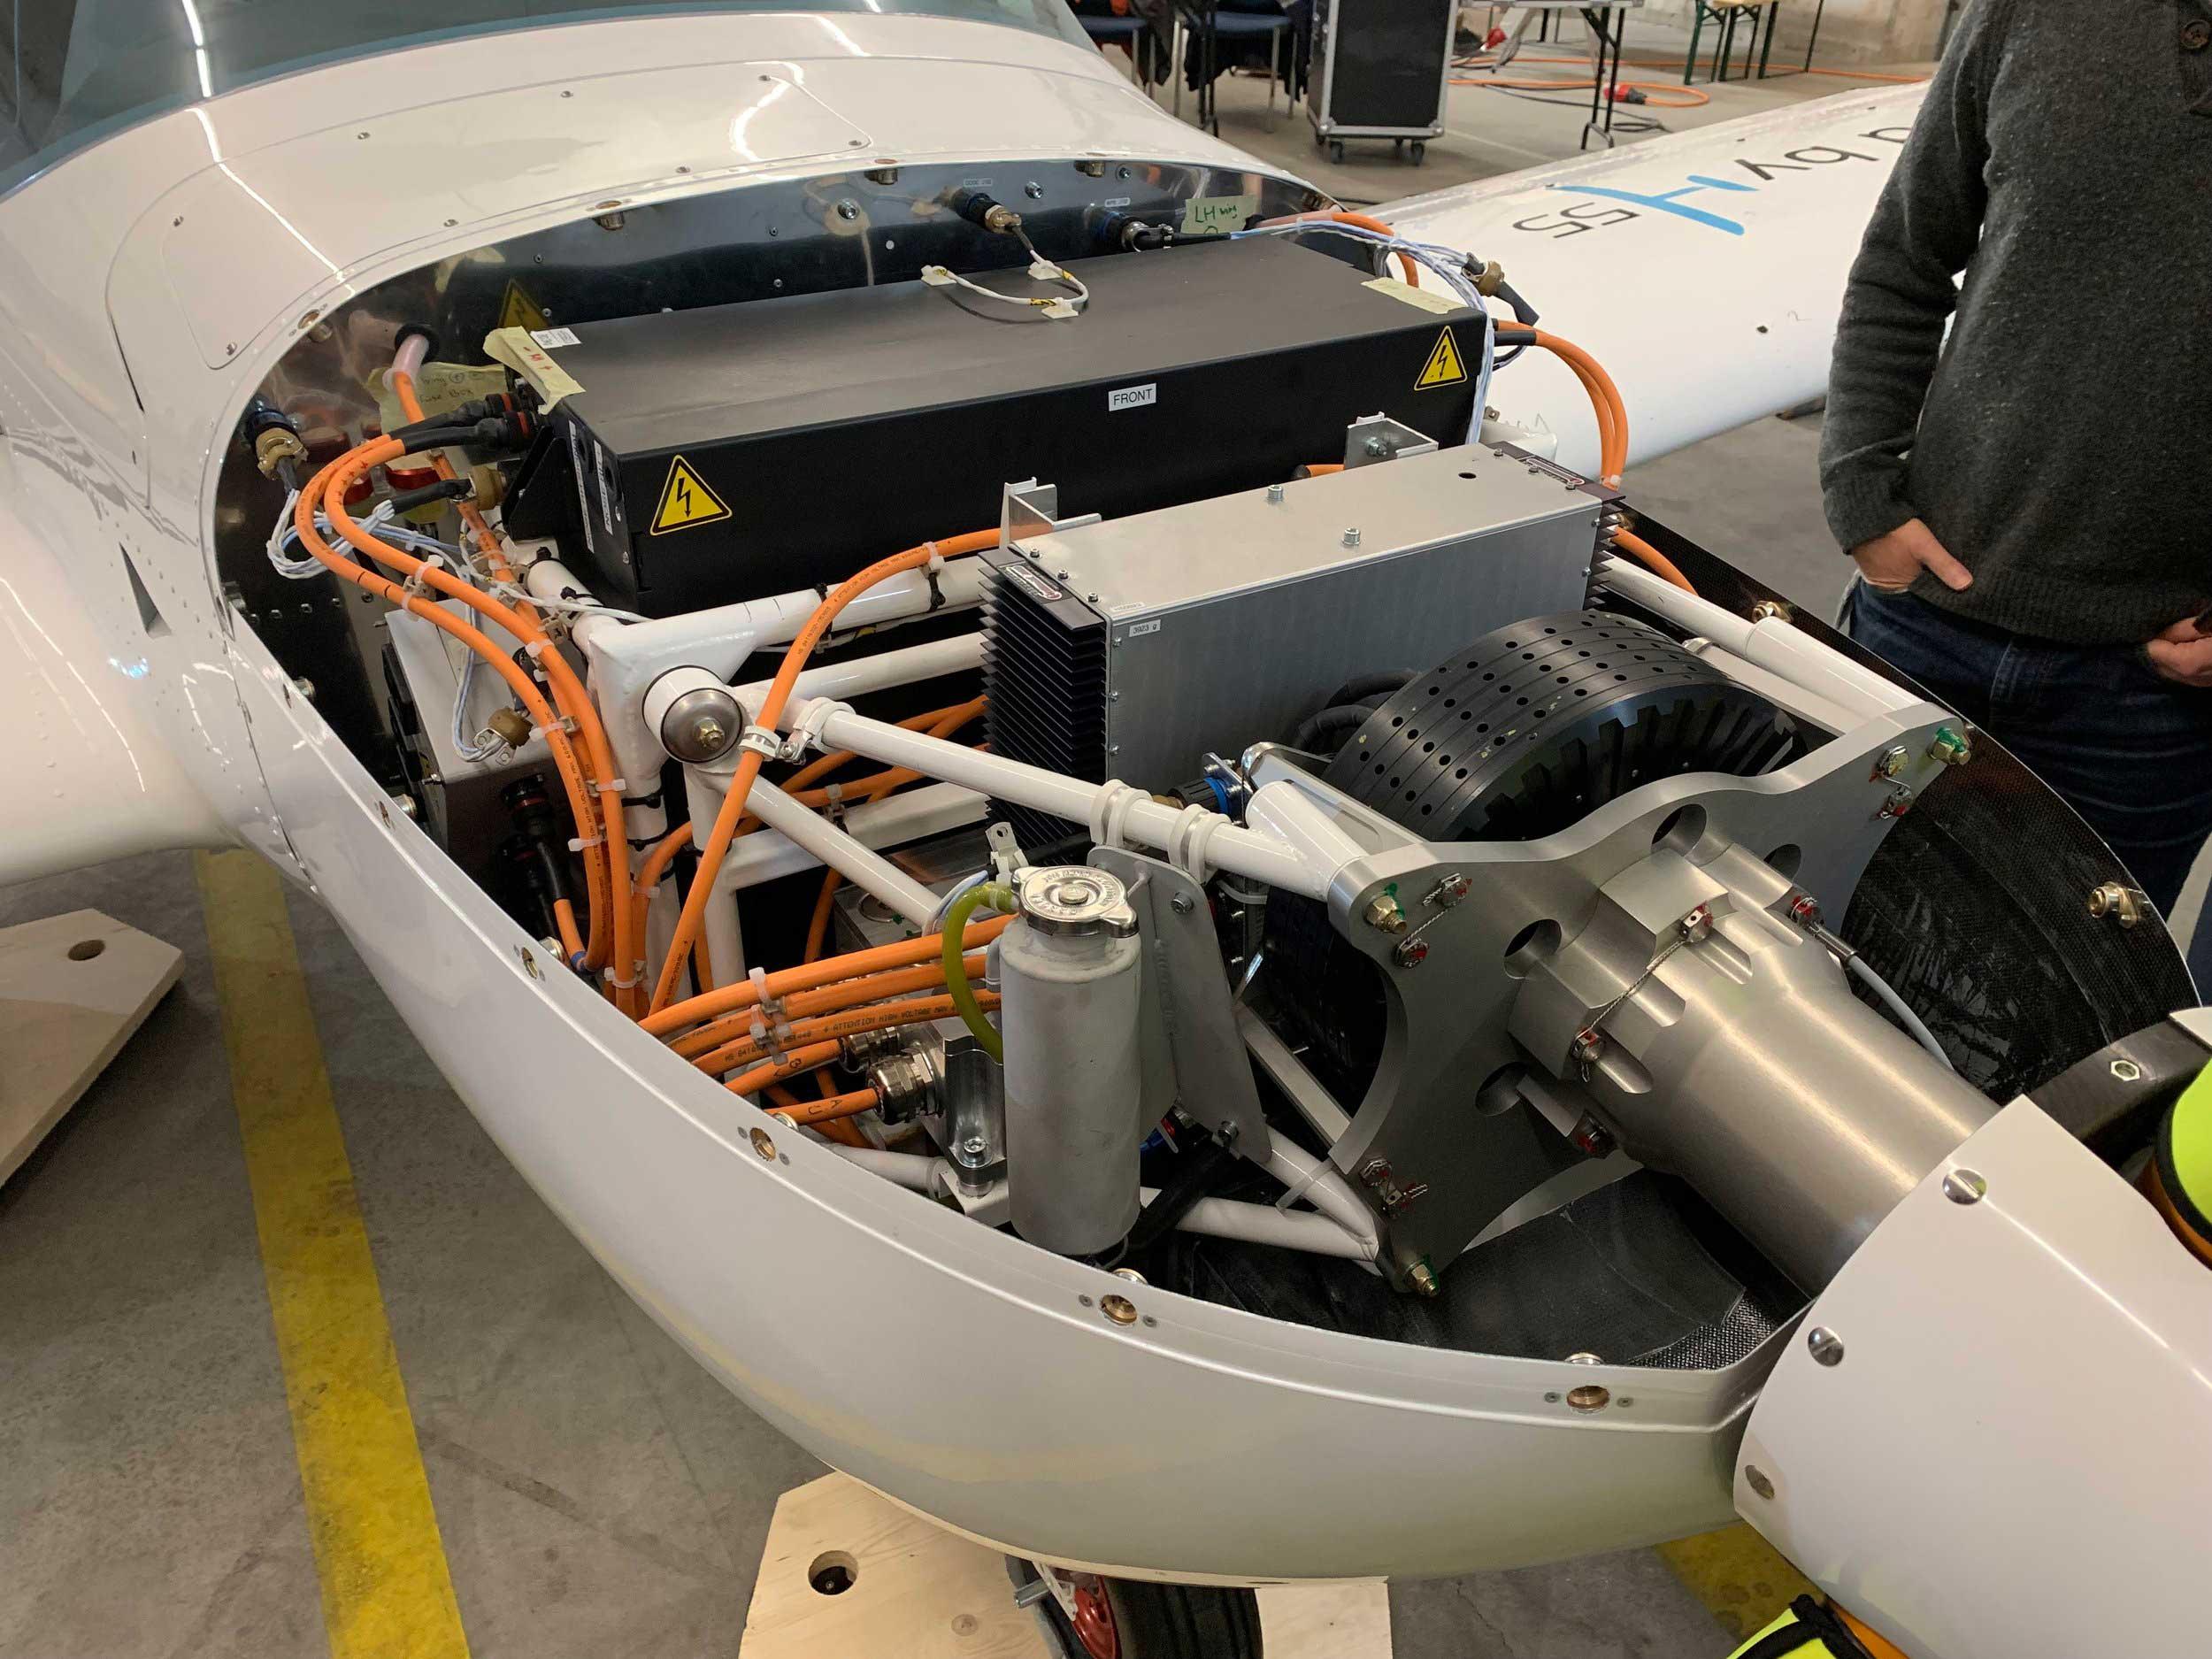 H55 electric aircraft